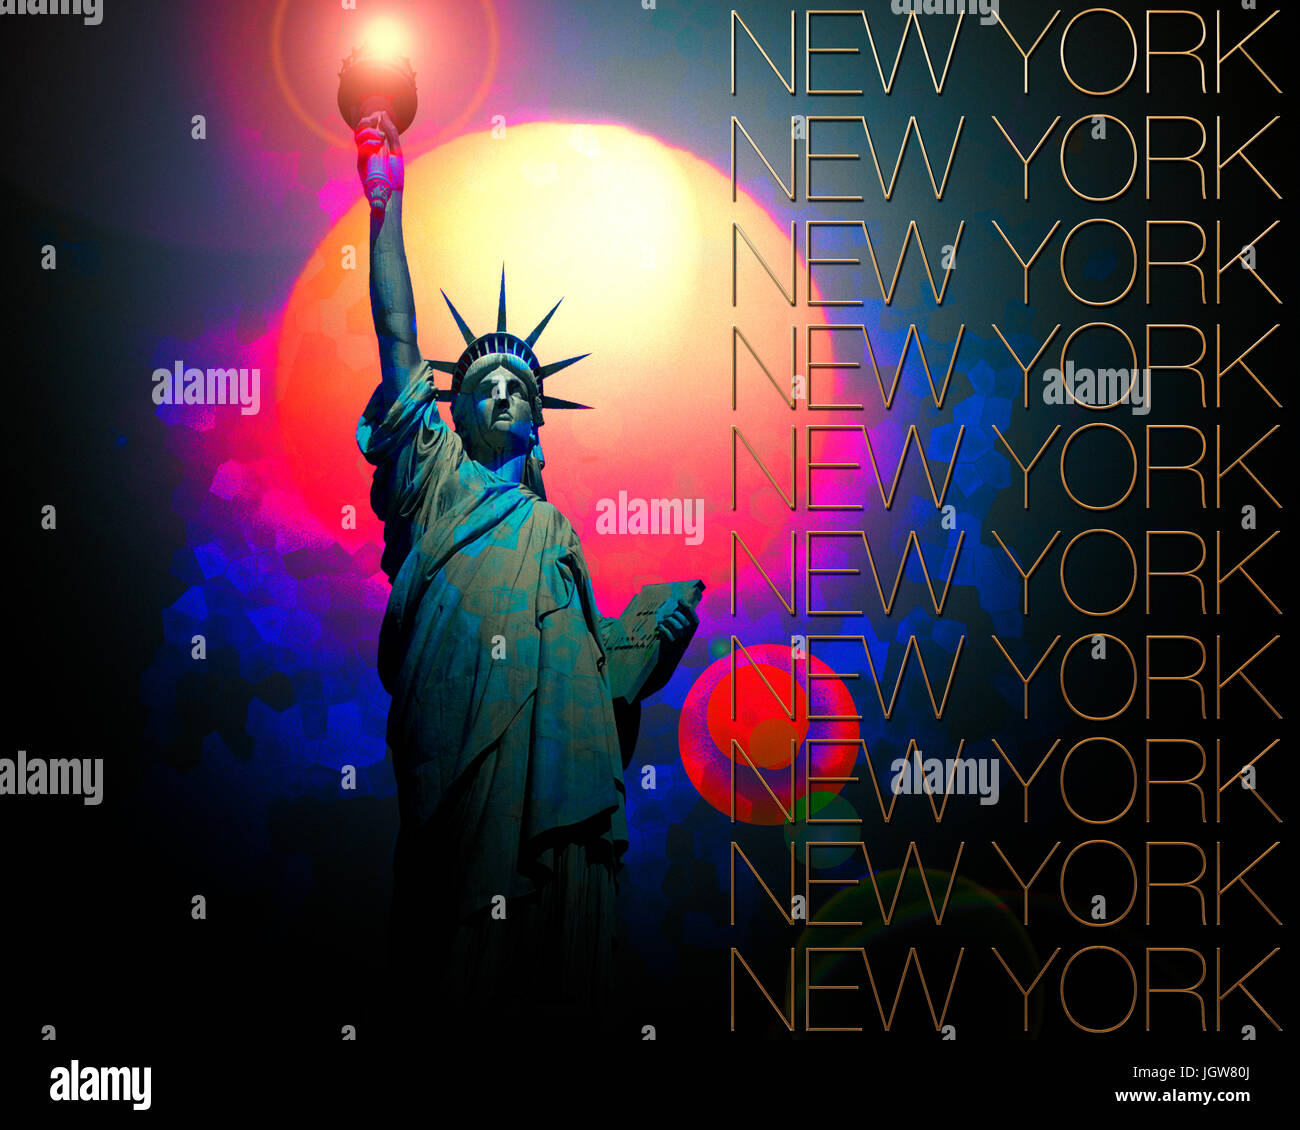 TRAVEL DESIGN: New York - Stock Image